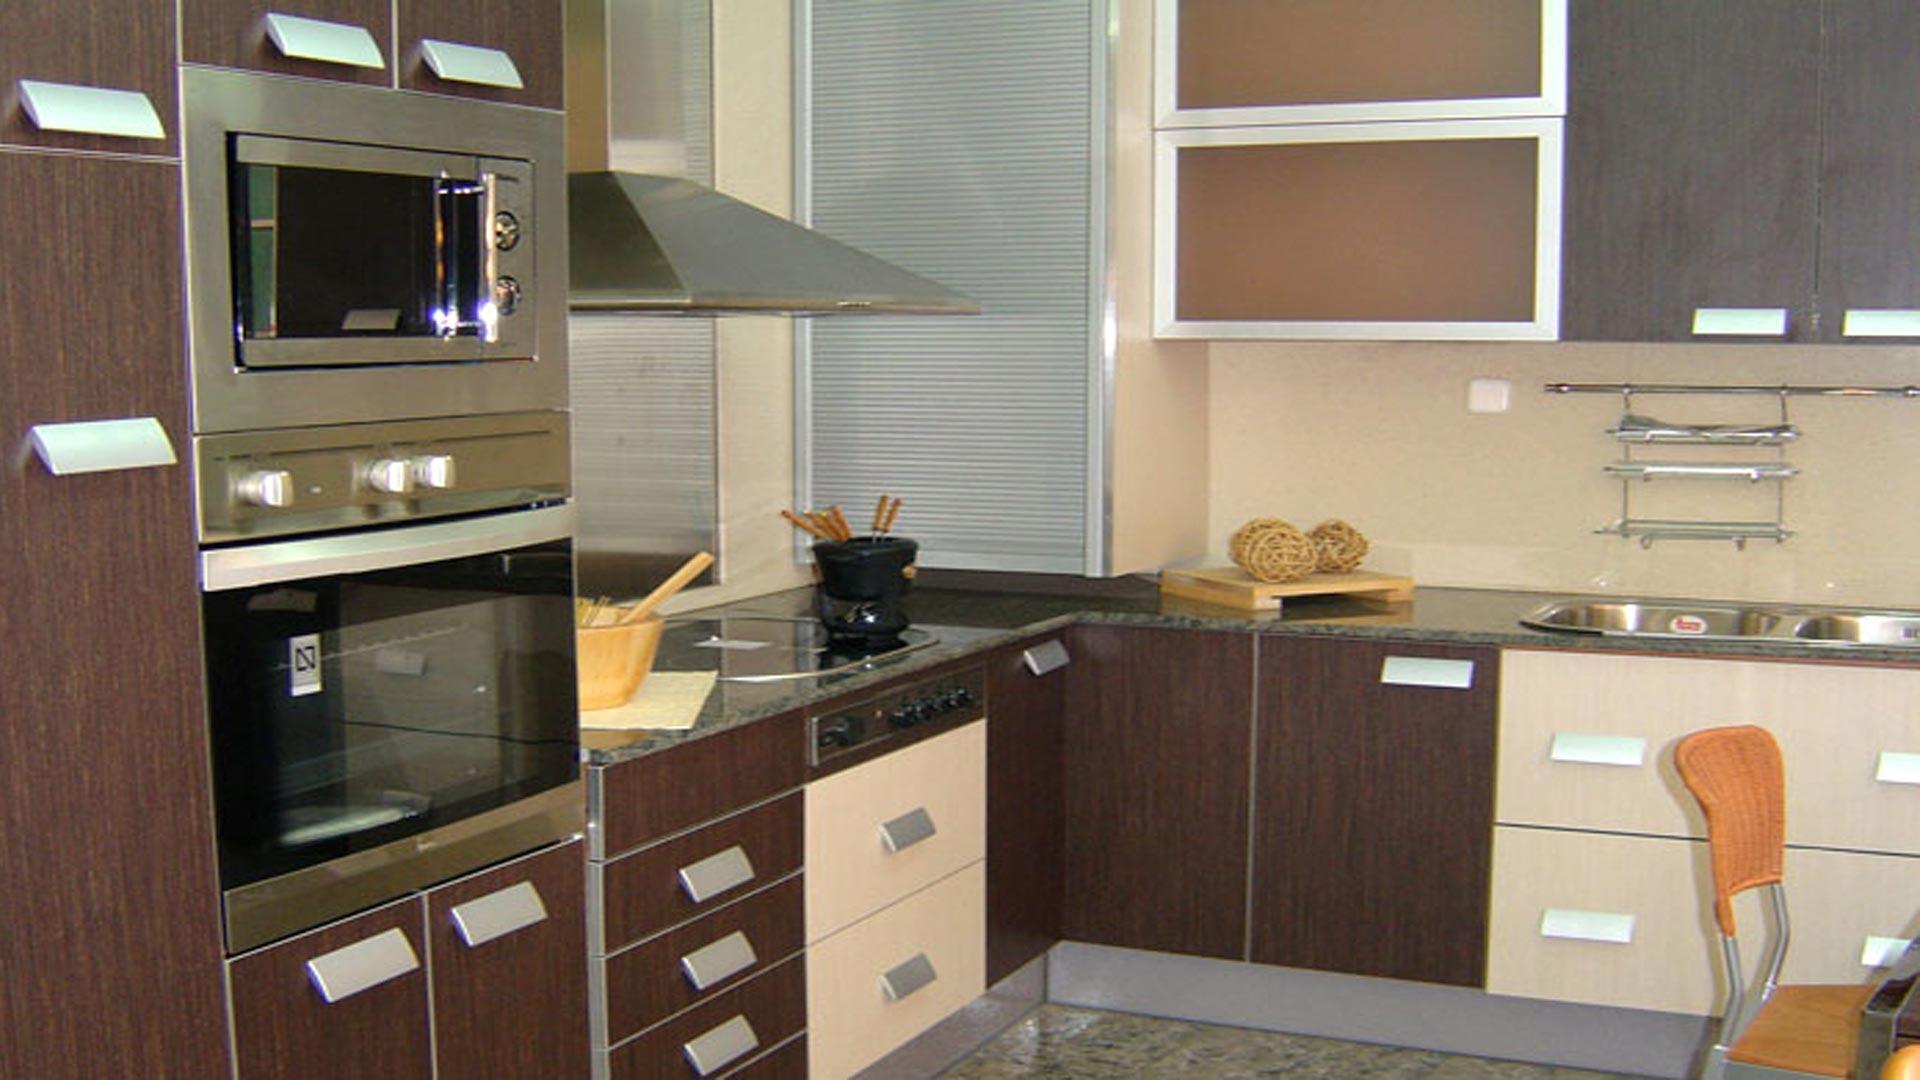 Renovar la cocina sin reformas for Renovar cocina sin obras